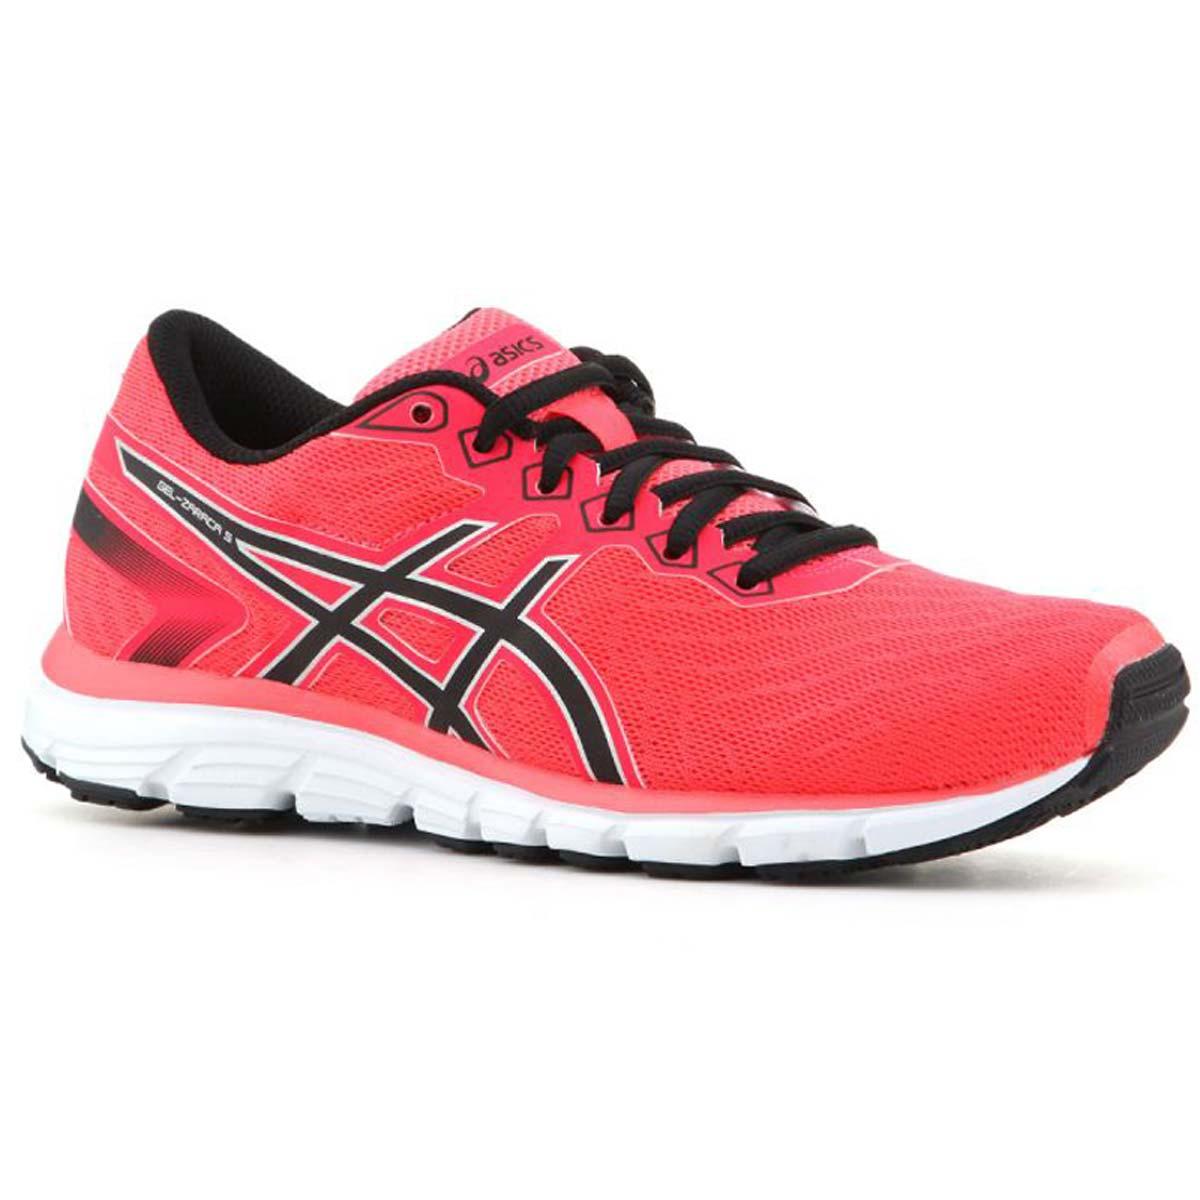 Asics Gel Zaraca 5 Womens Running Shoes (PinkBlackSilver)